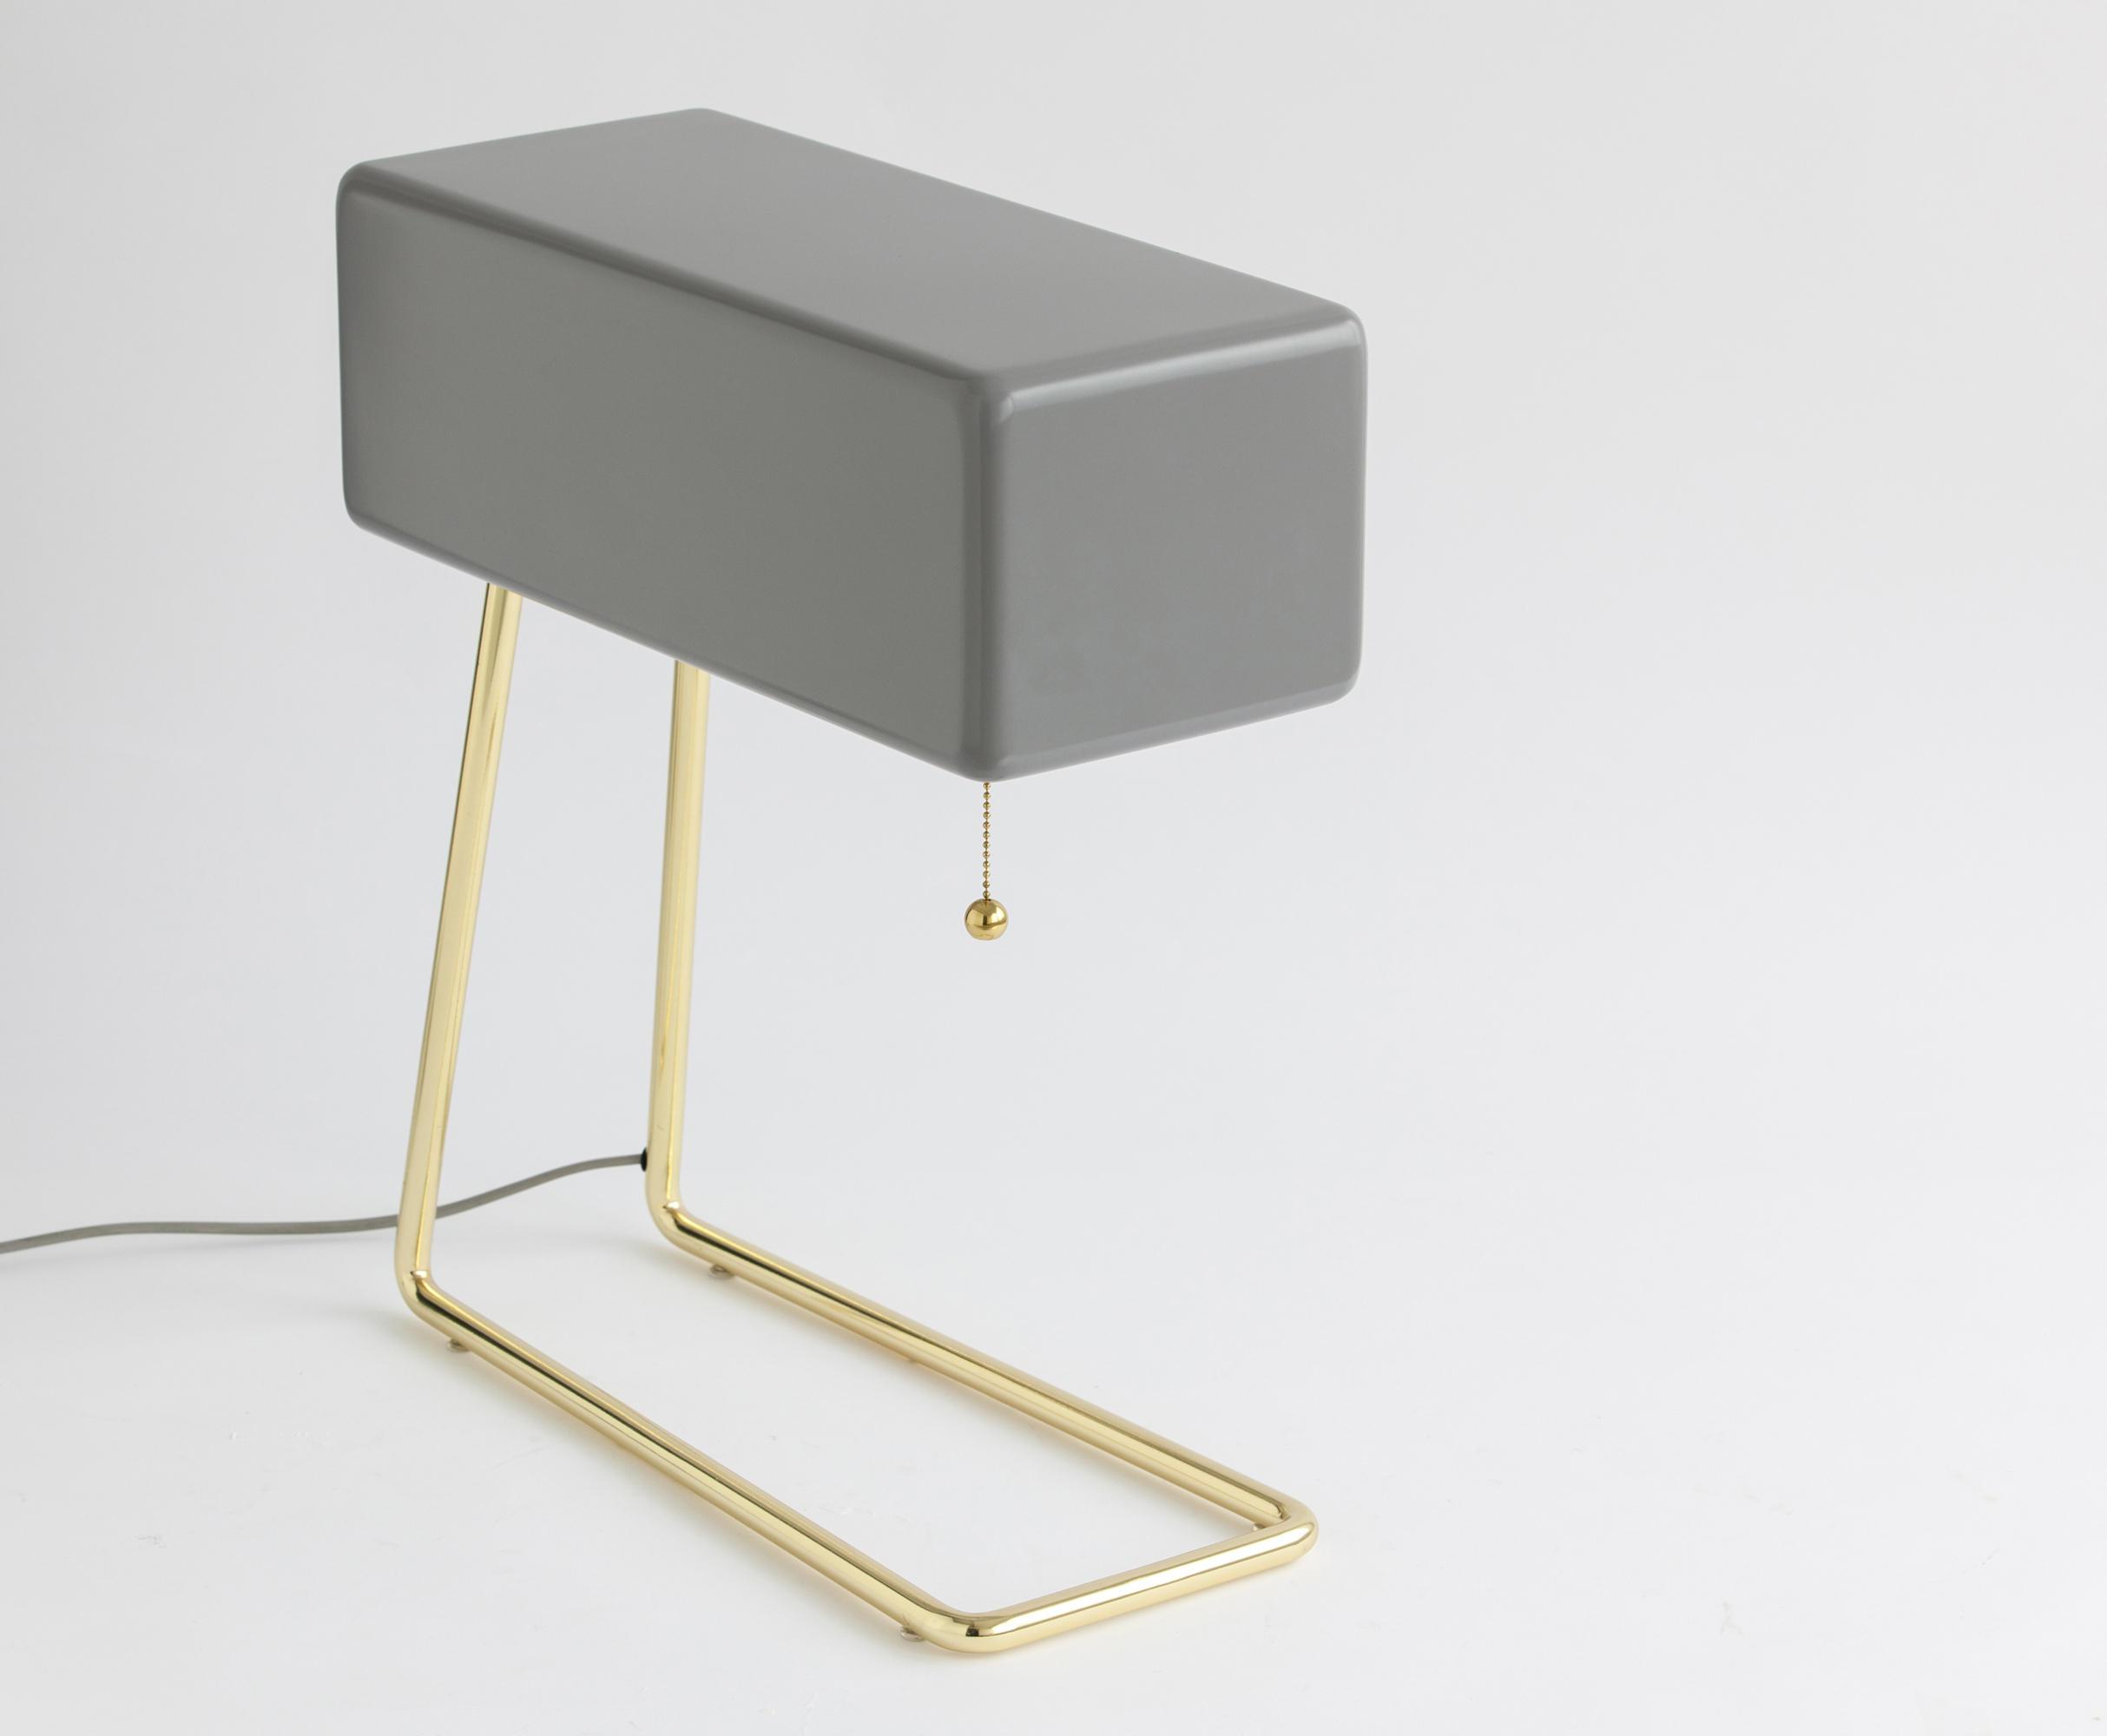 Toffoli led table lamp general lighting from imamura for Table design led